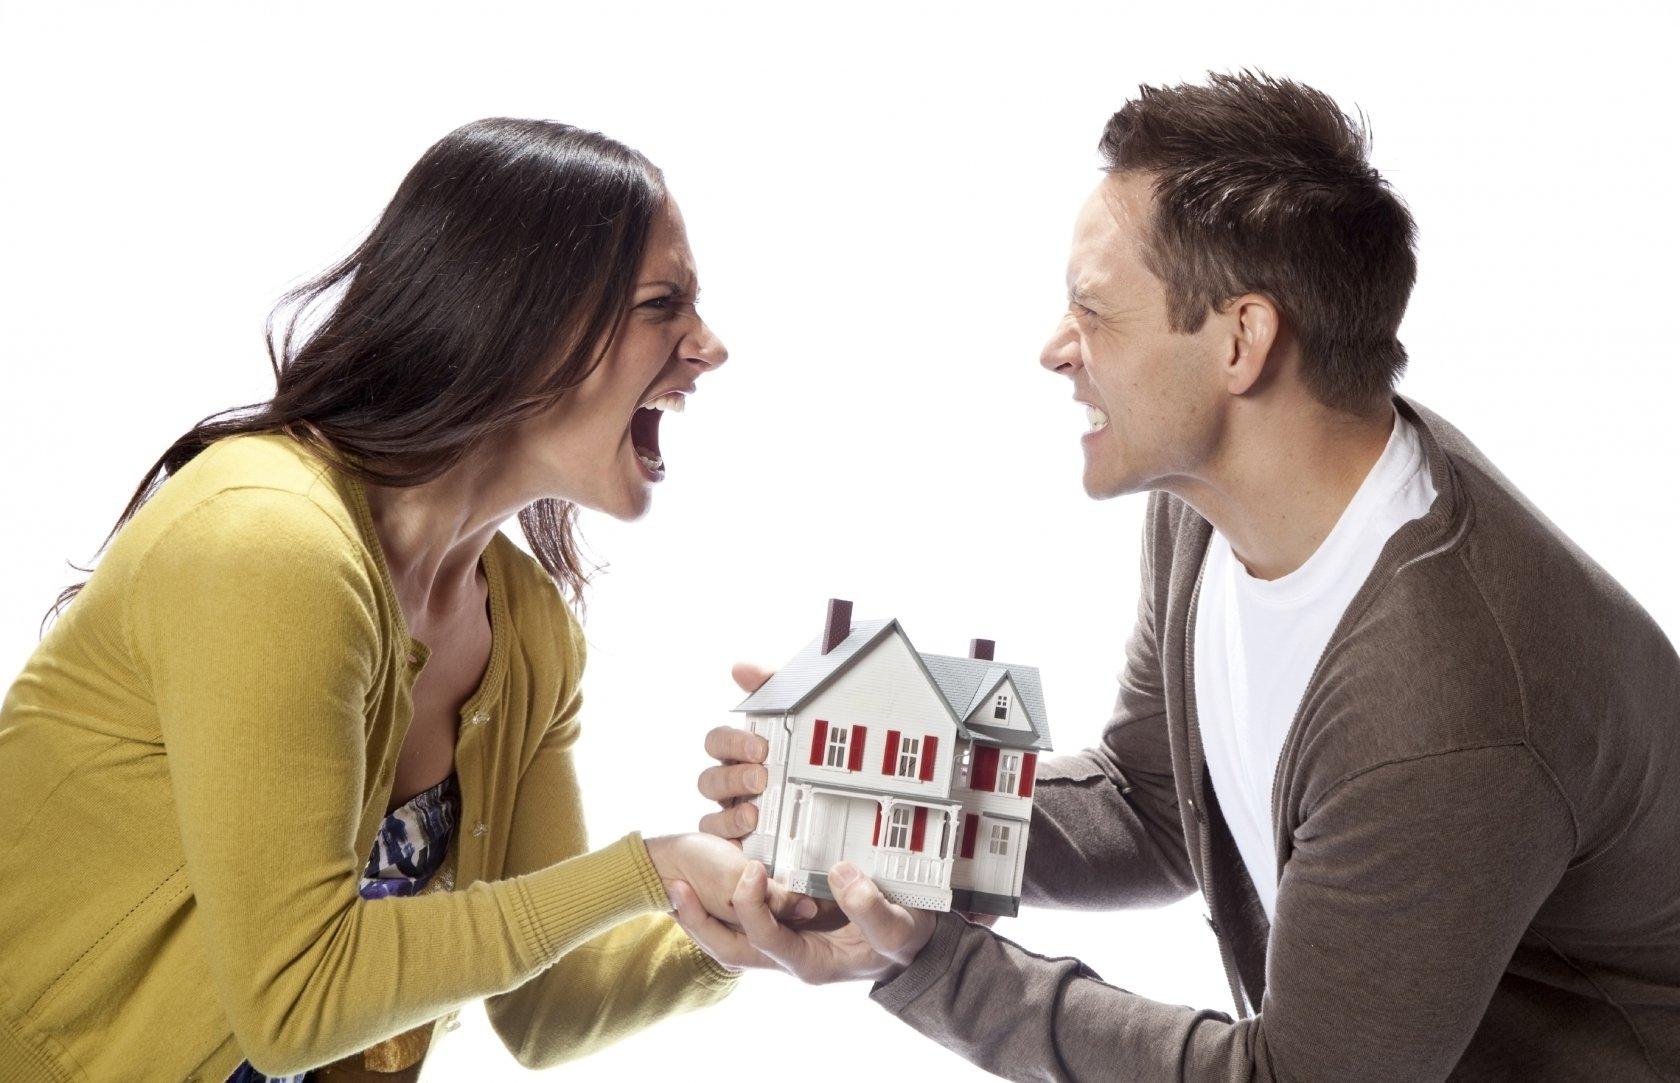 раздел имущества при разводе немного